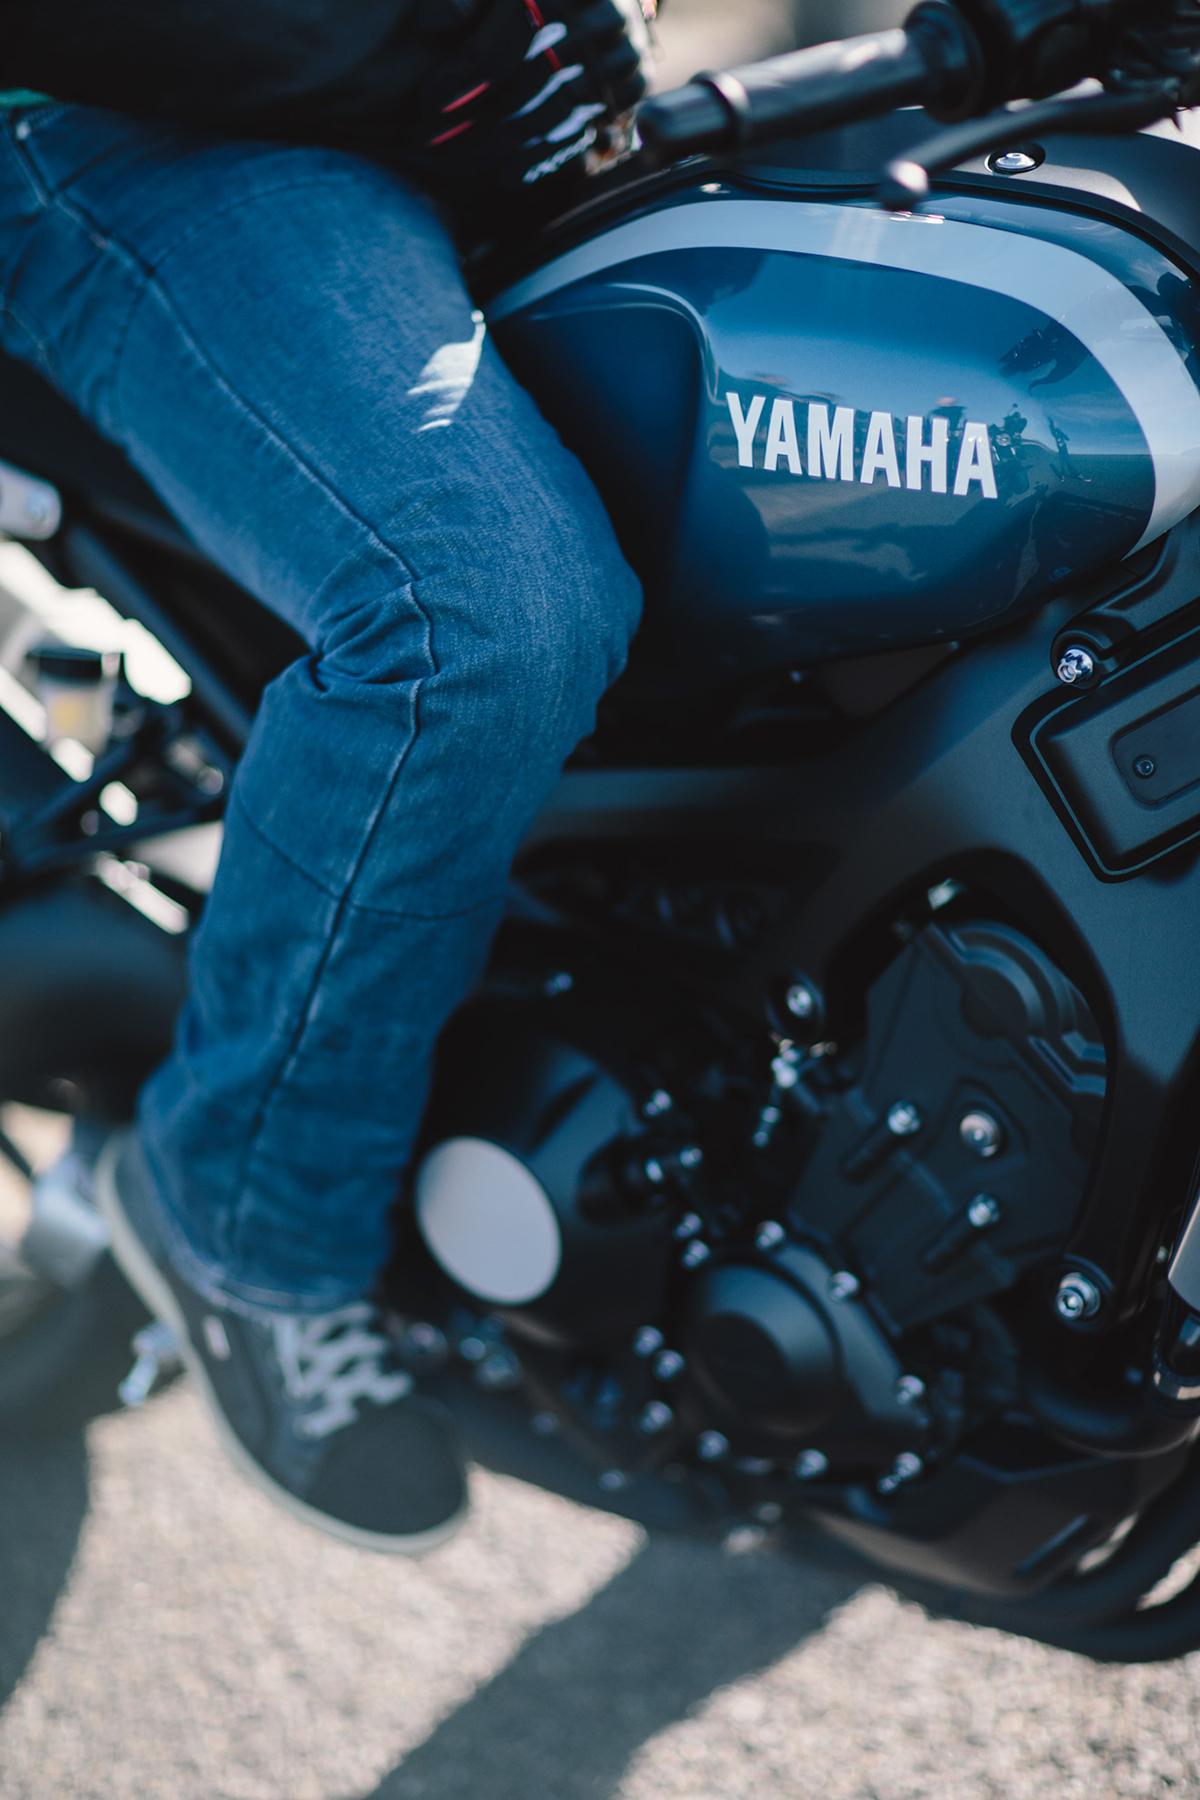 Yamaha-XSR-700-900_0539